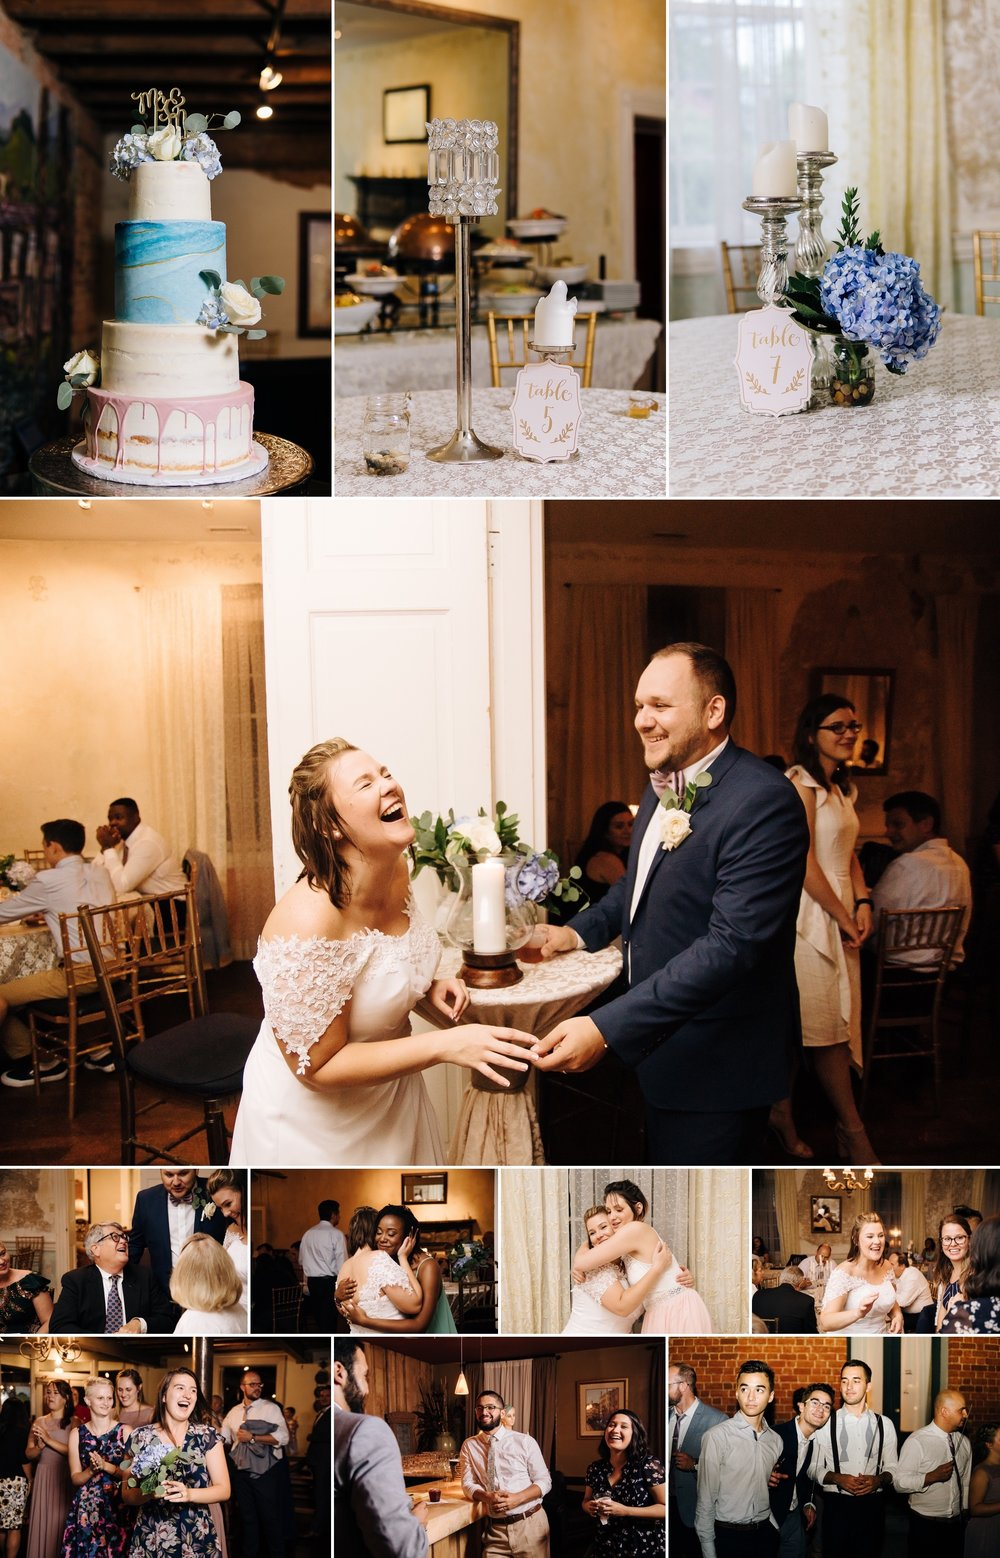 intimate_kyle_house_wedding_virginia_jonathan_hannah_photography-14.jpg